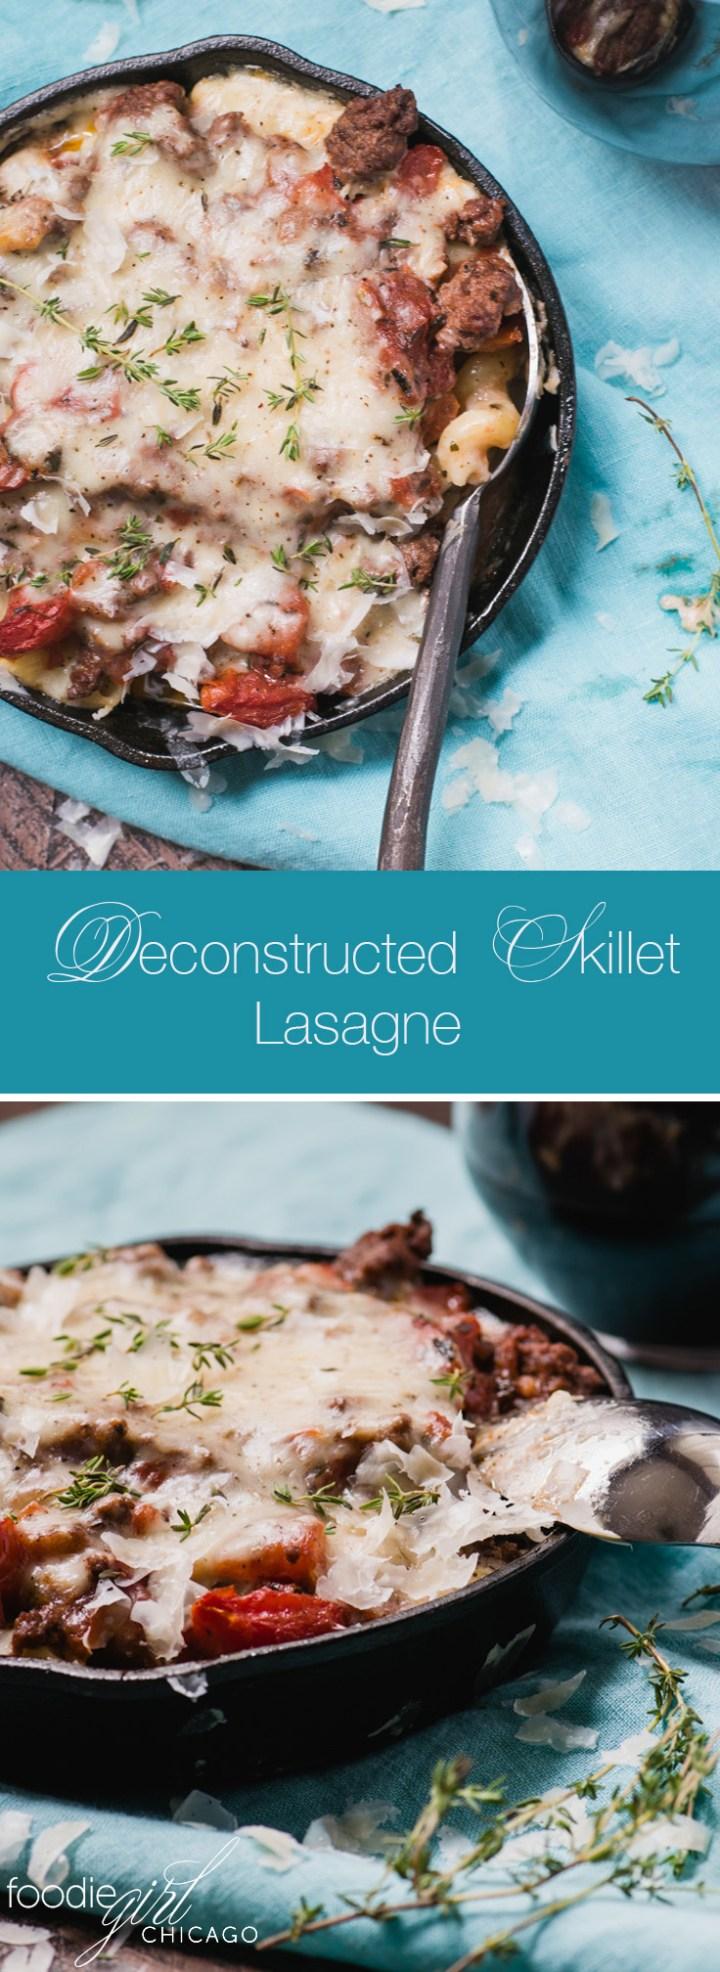 Deconstructed Skillet Lasagne